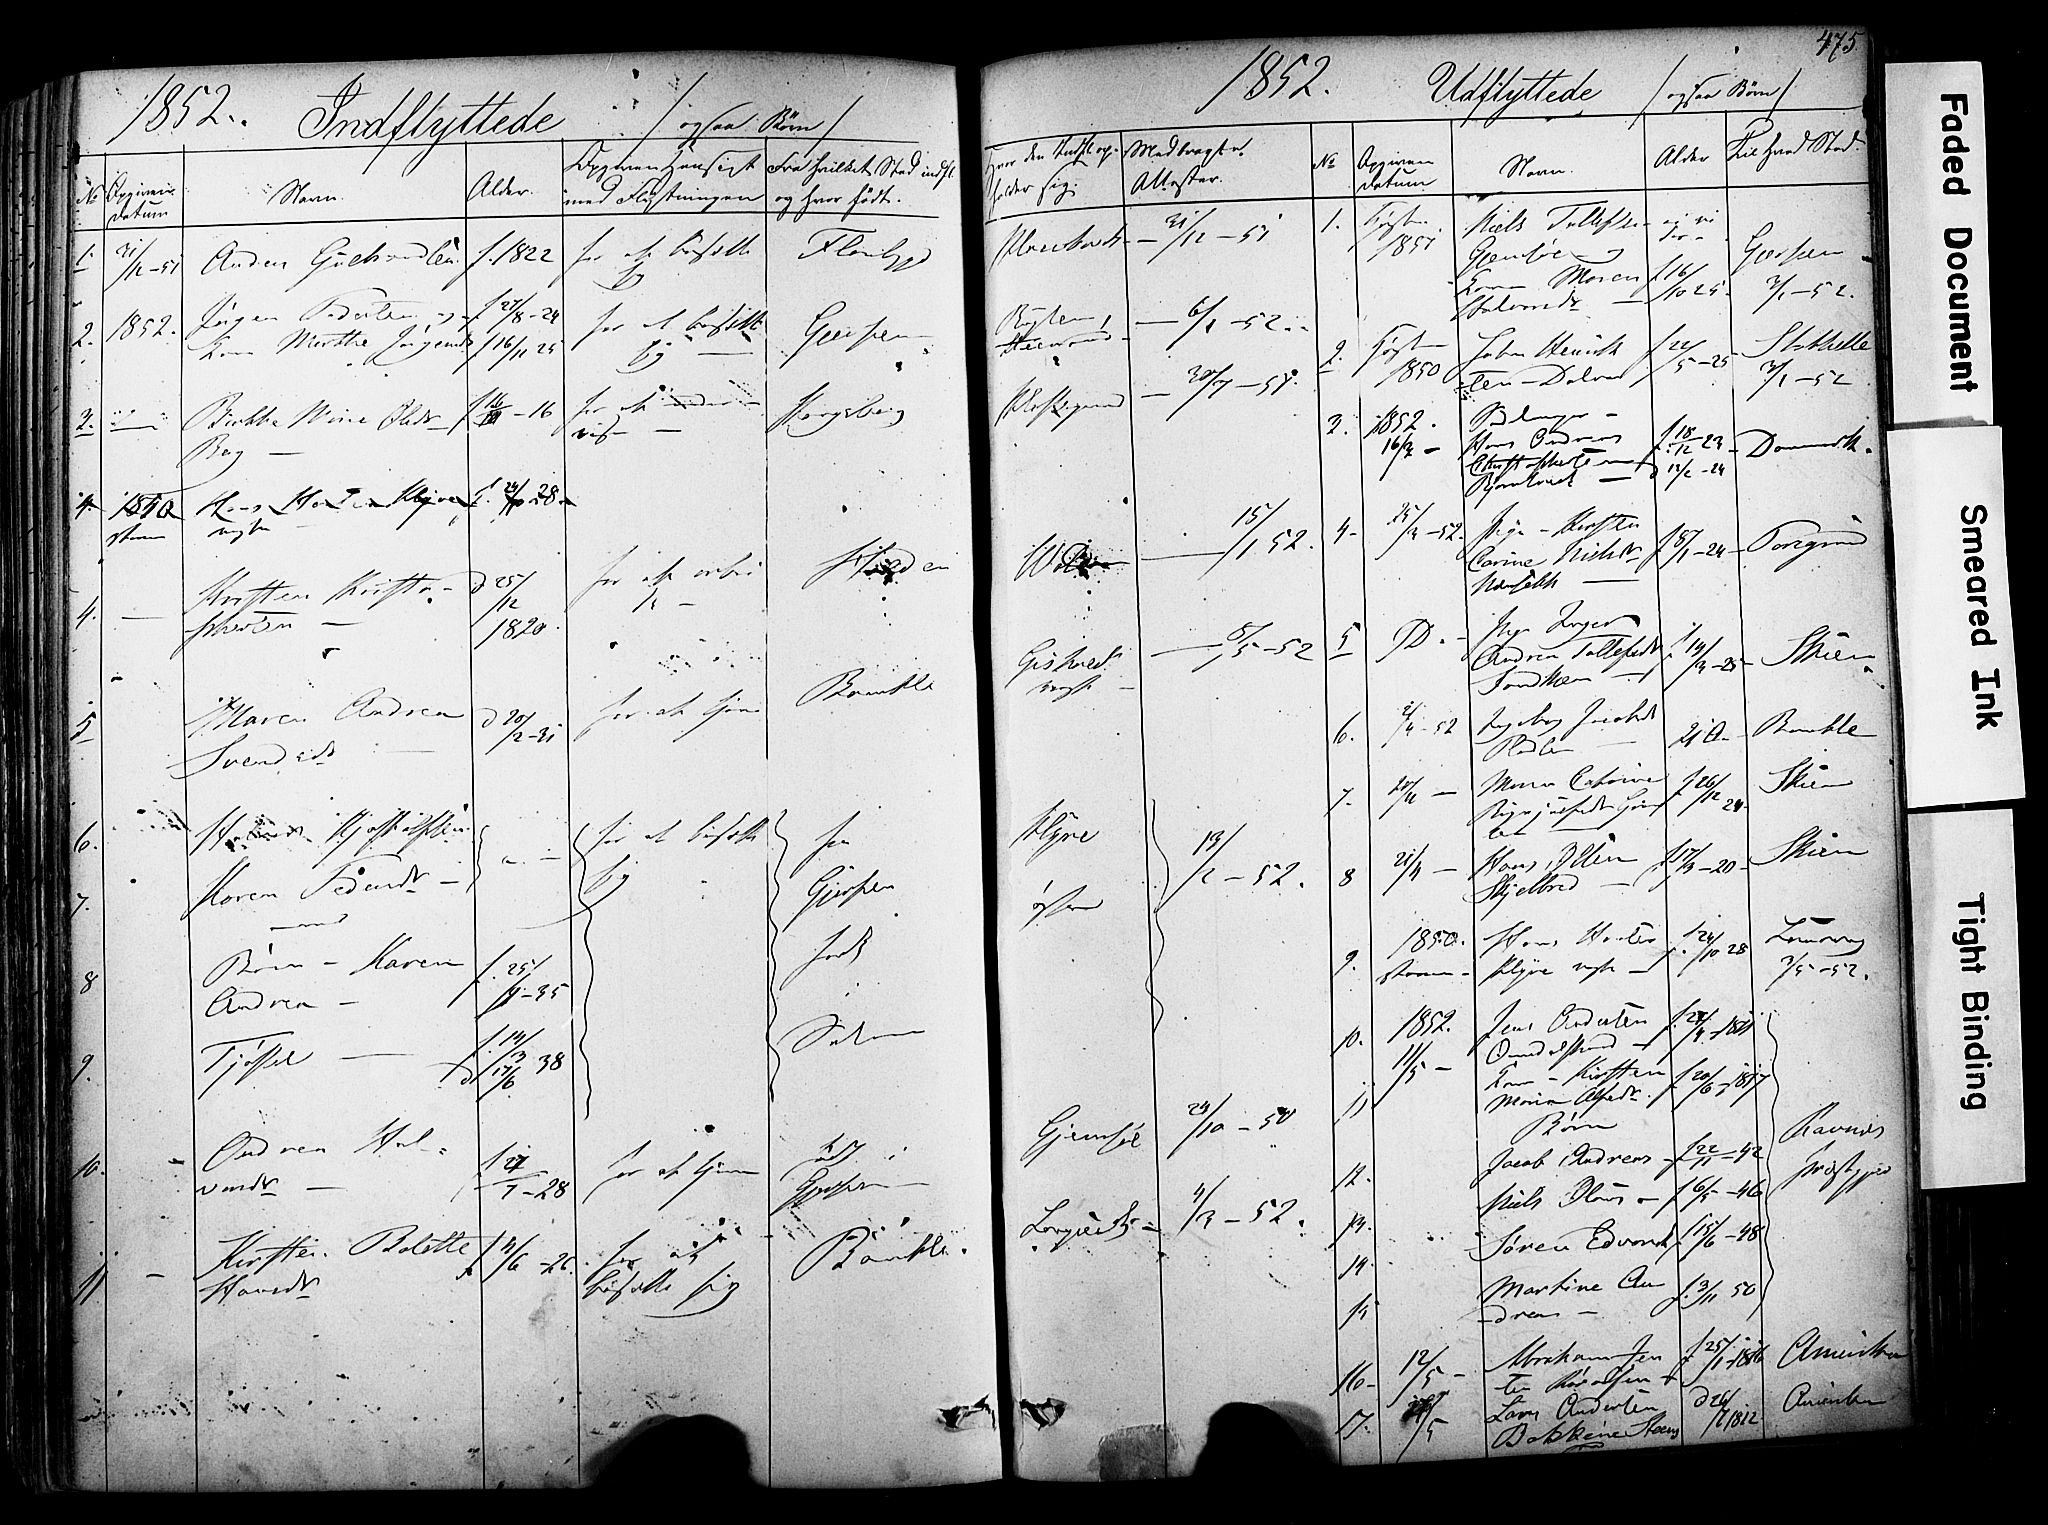 SAKO, Solum kirkebøker, F/Fa/L0006: Ministerialbok nr. I 6, 1844-1855, s. 475